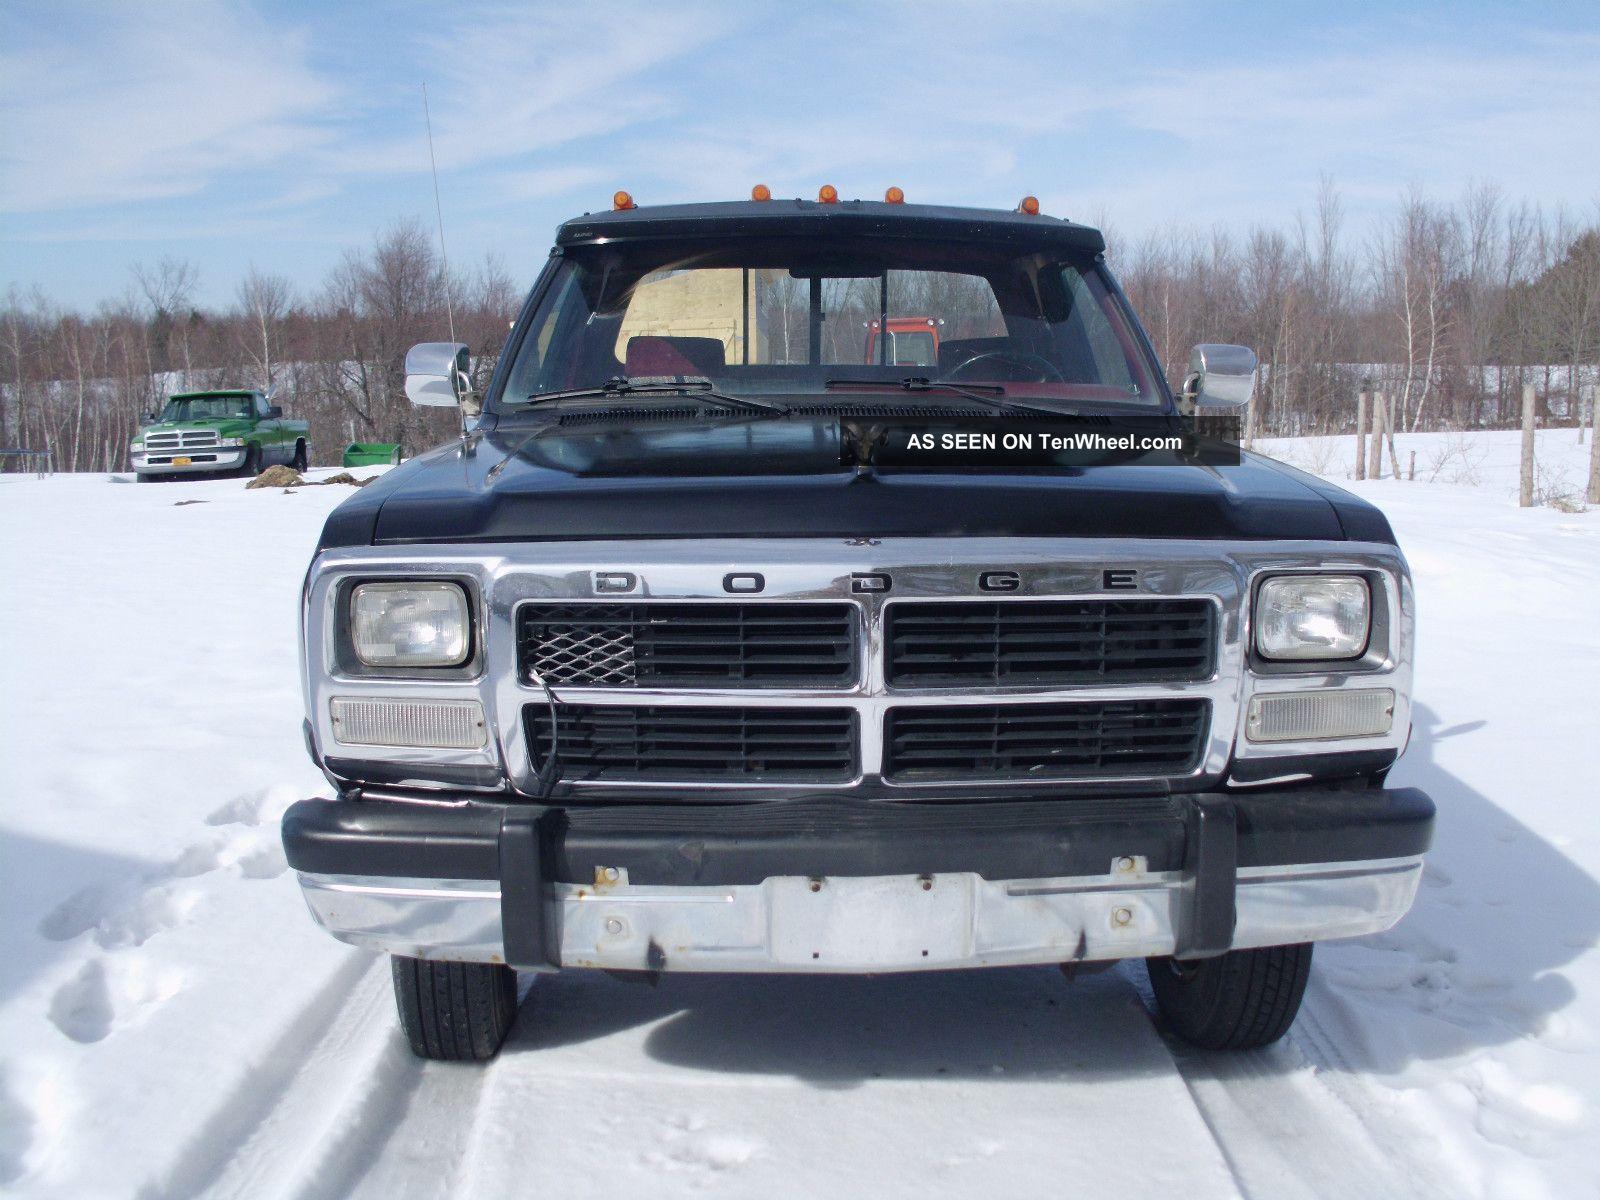 1992 dodge ram 350 cummins turbo diesel dually 4x4. Black Bedroom Furniture Sets. Home Design Ideas